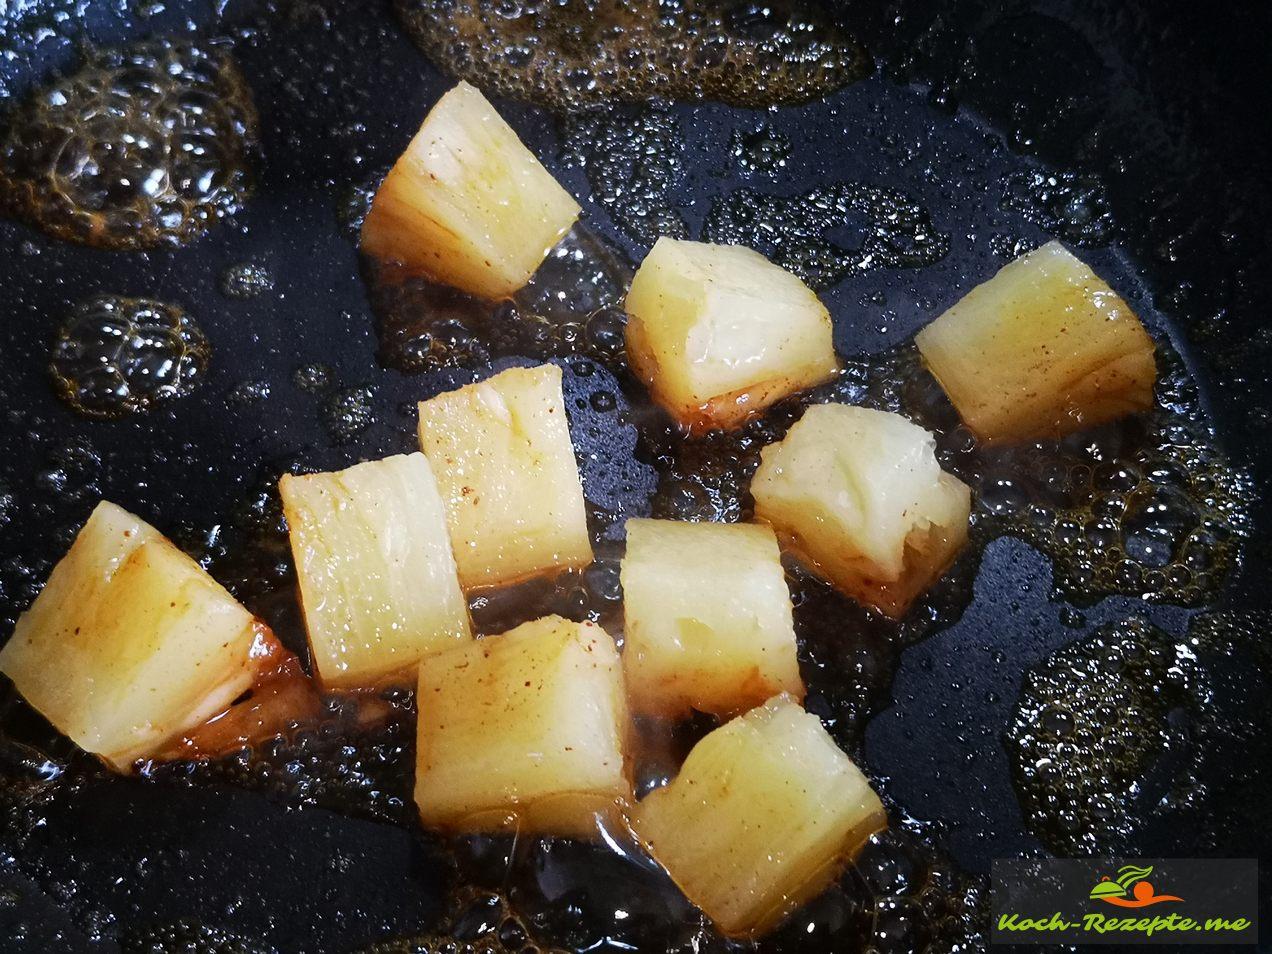 Ananas kurz anbraten raus nehmen